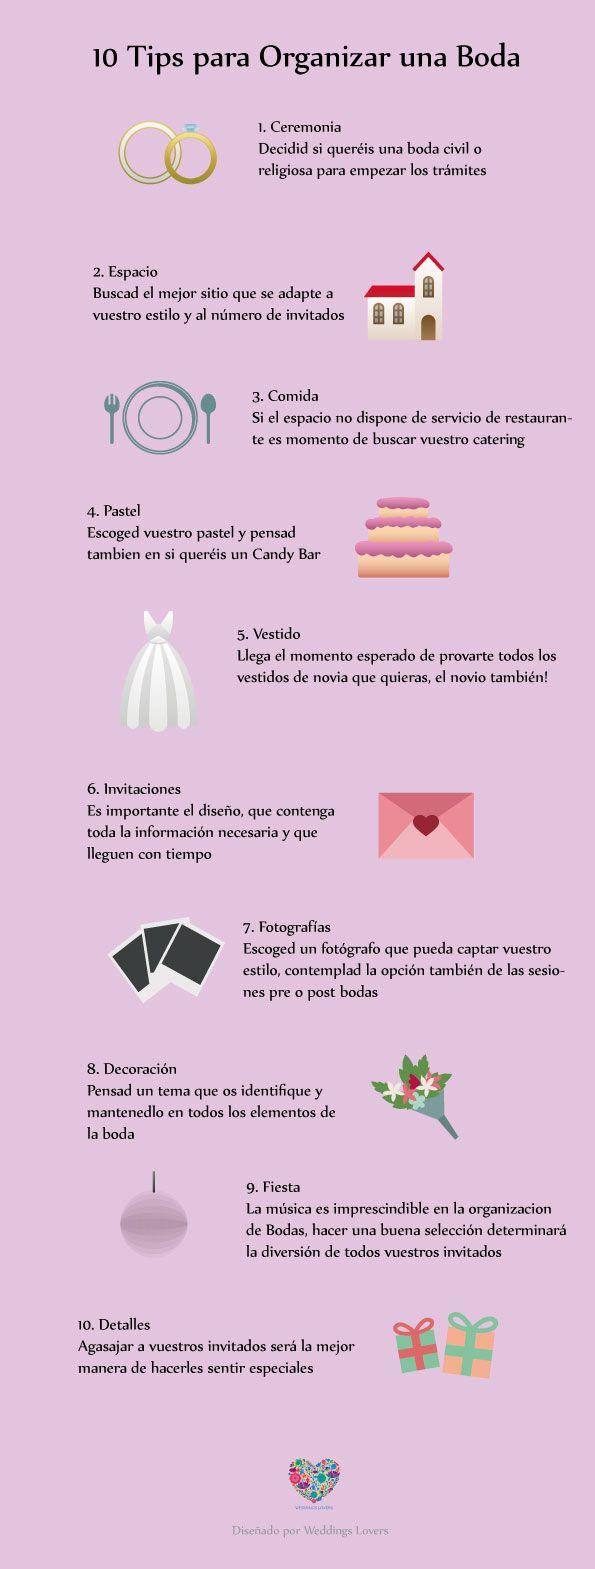 10 tips para organizar una boda | Weddings Lovers | Pinterest | Boda ...